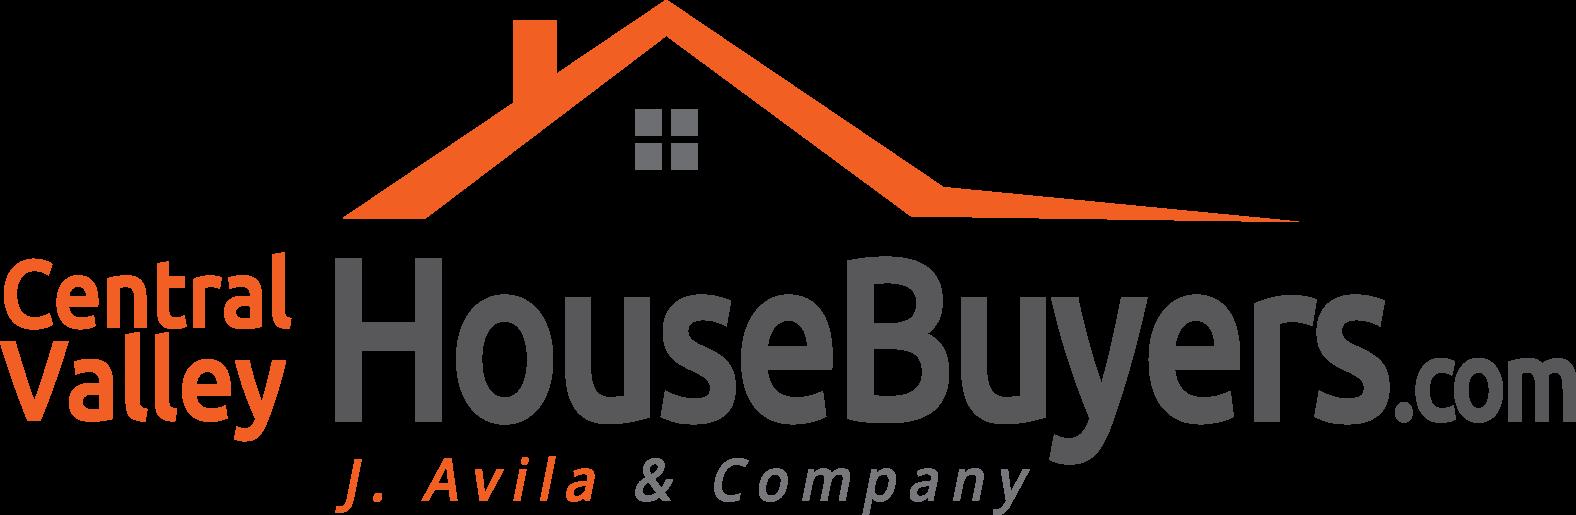 CentralValleyHousesWholesale.com logo